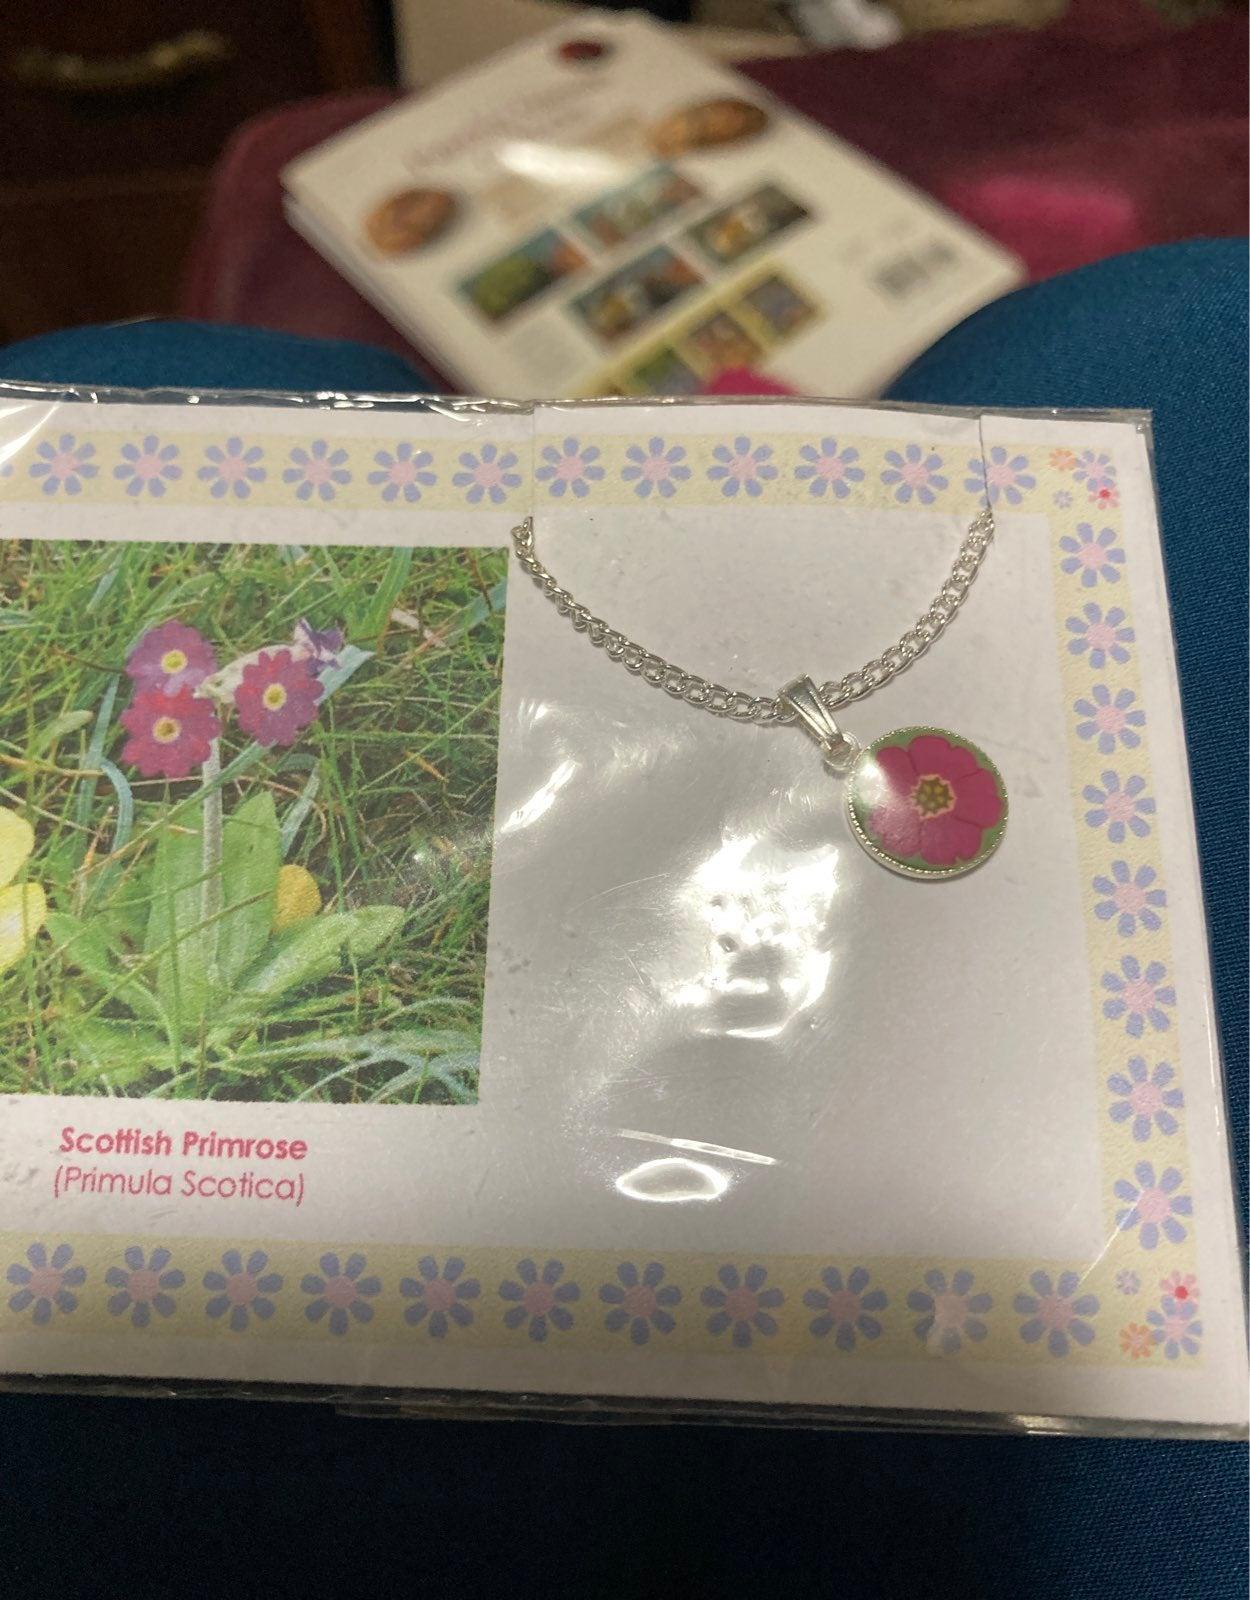 Scottish primeose necklace